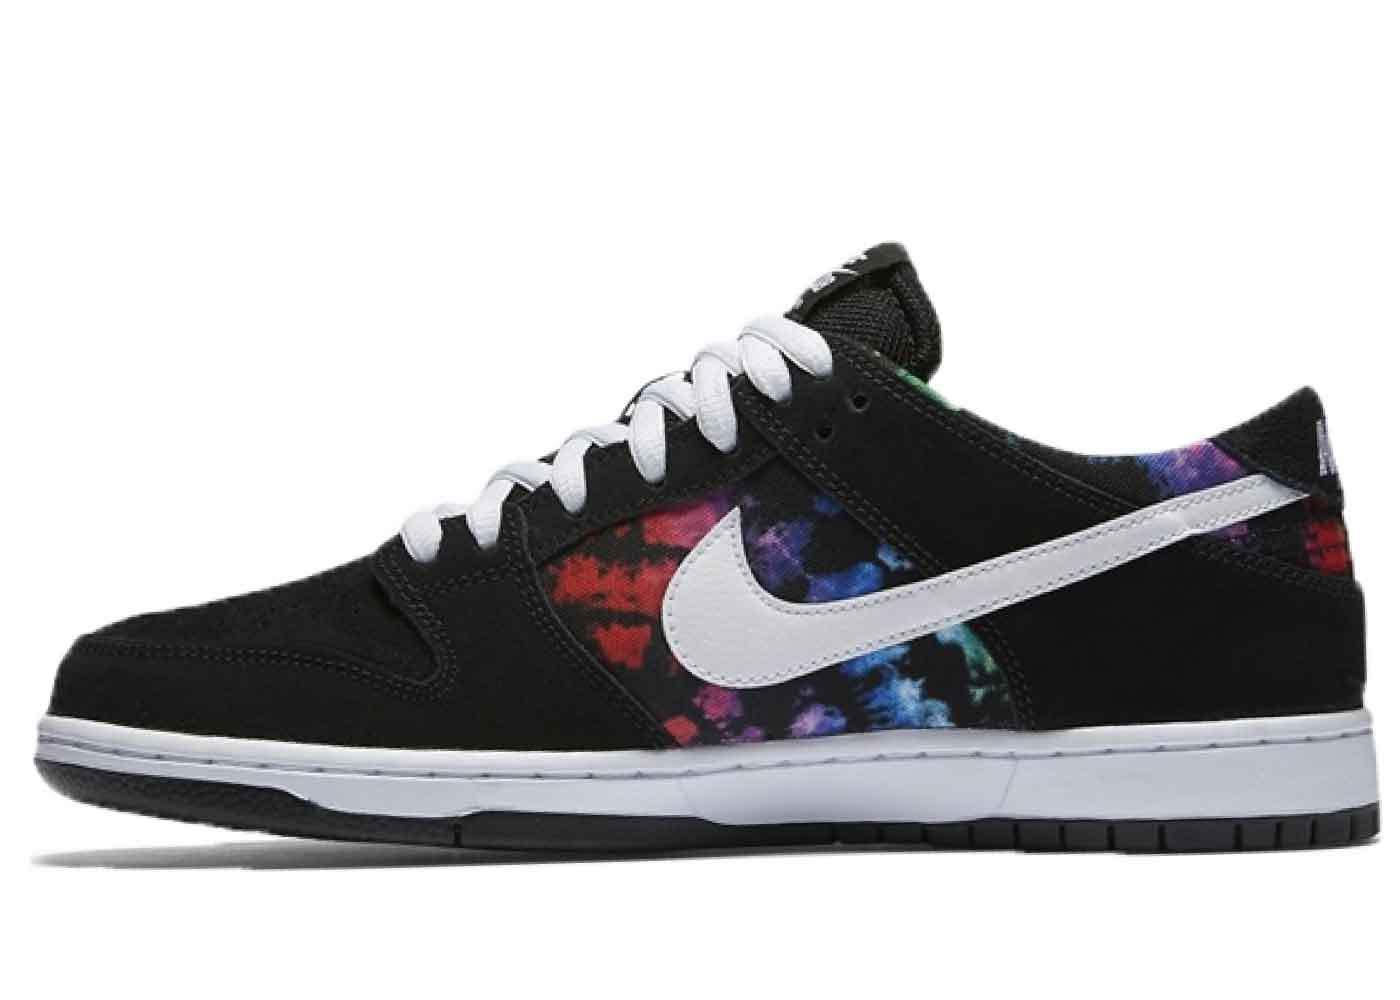 Nike SB Dunk Low Ishod Wair Tie Dyeの写真